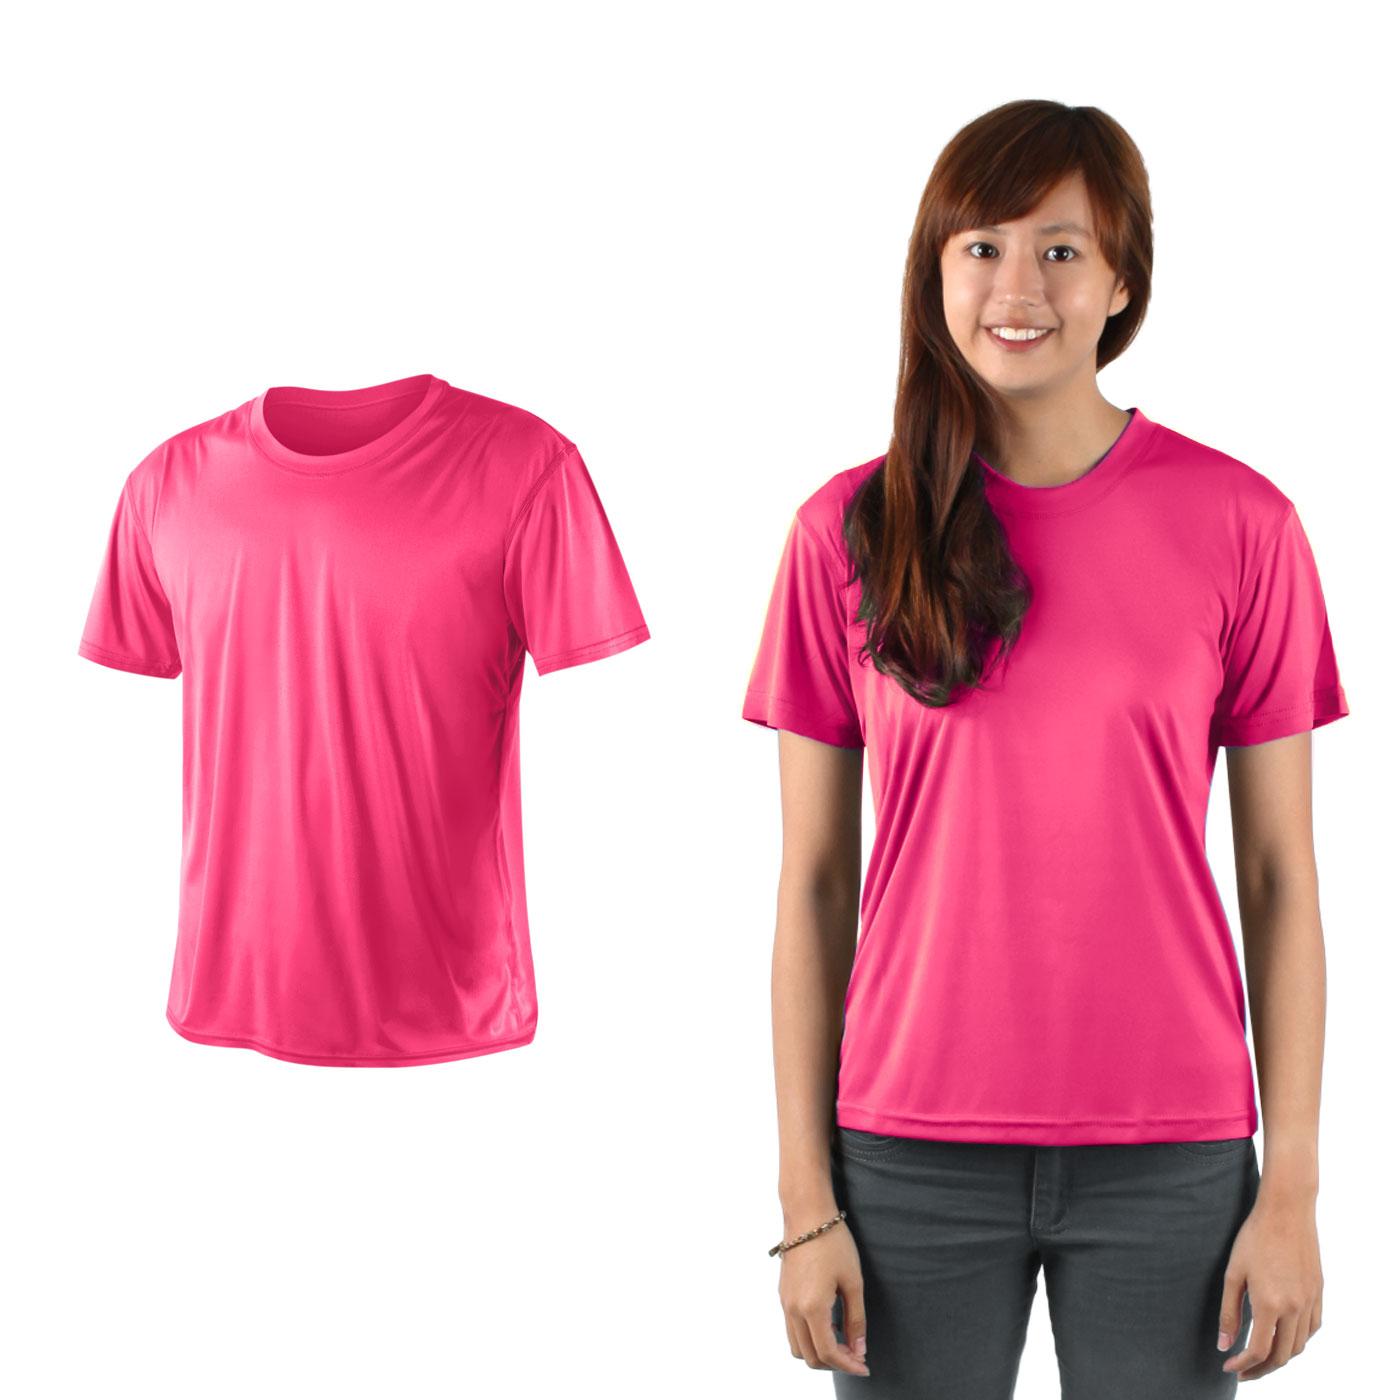 HODARLA 激膚無感衣3103901 - 透明粉紅